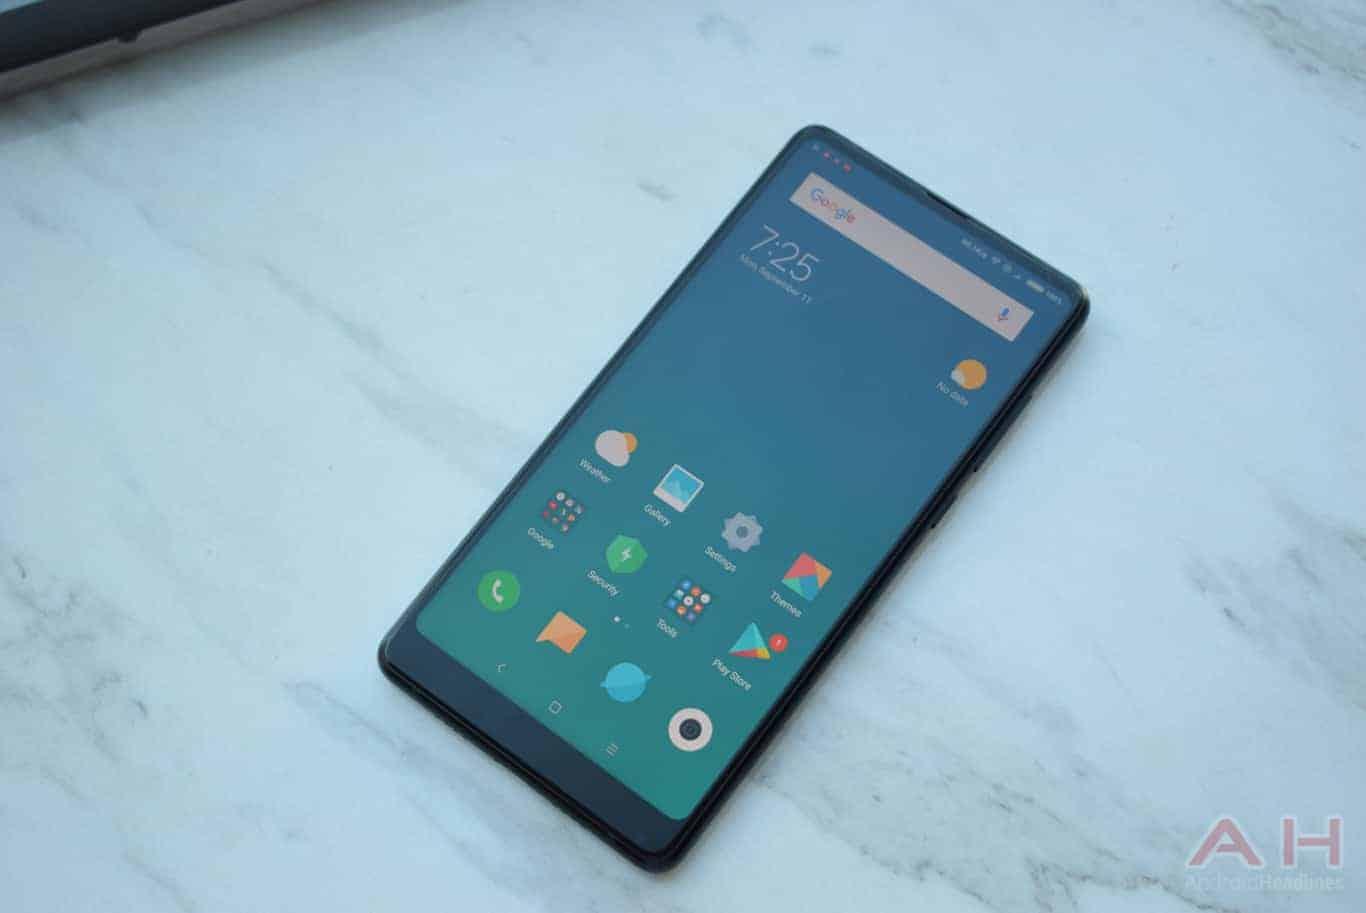 Xiaomi Mi MIX 2 Hands On AM AH 1